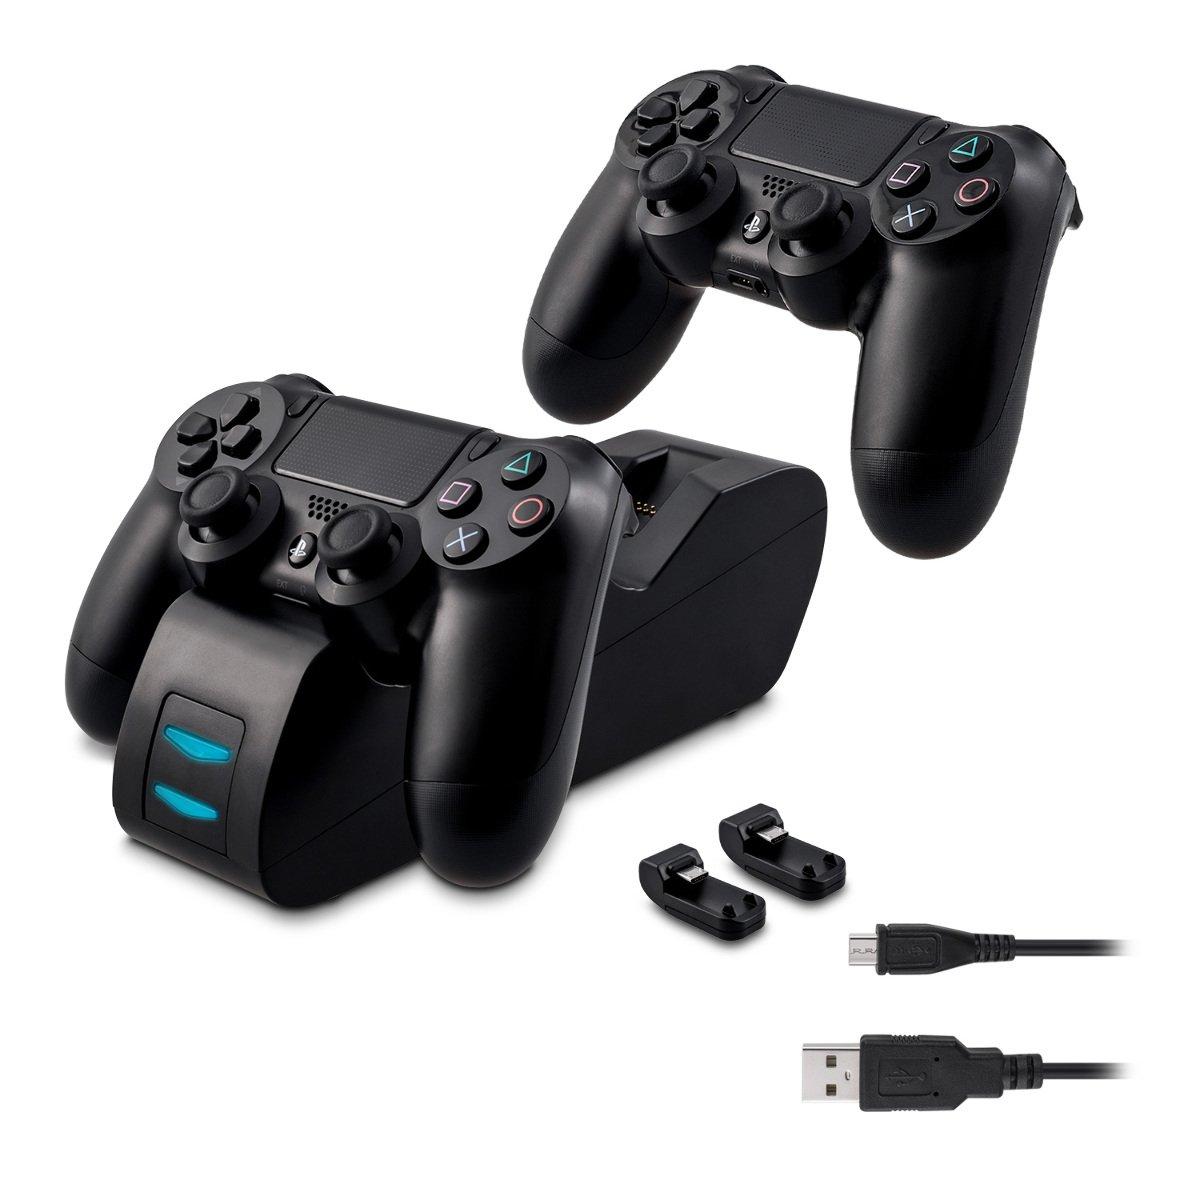 kwmobile Estació n de Carga rá pida Playstation 4 - Cargador Doble Mando PS4 - Base para Controles DualShock de Sony Playstation 4 con indicador LED KW-Commerce 34336_m000224